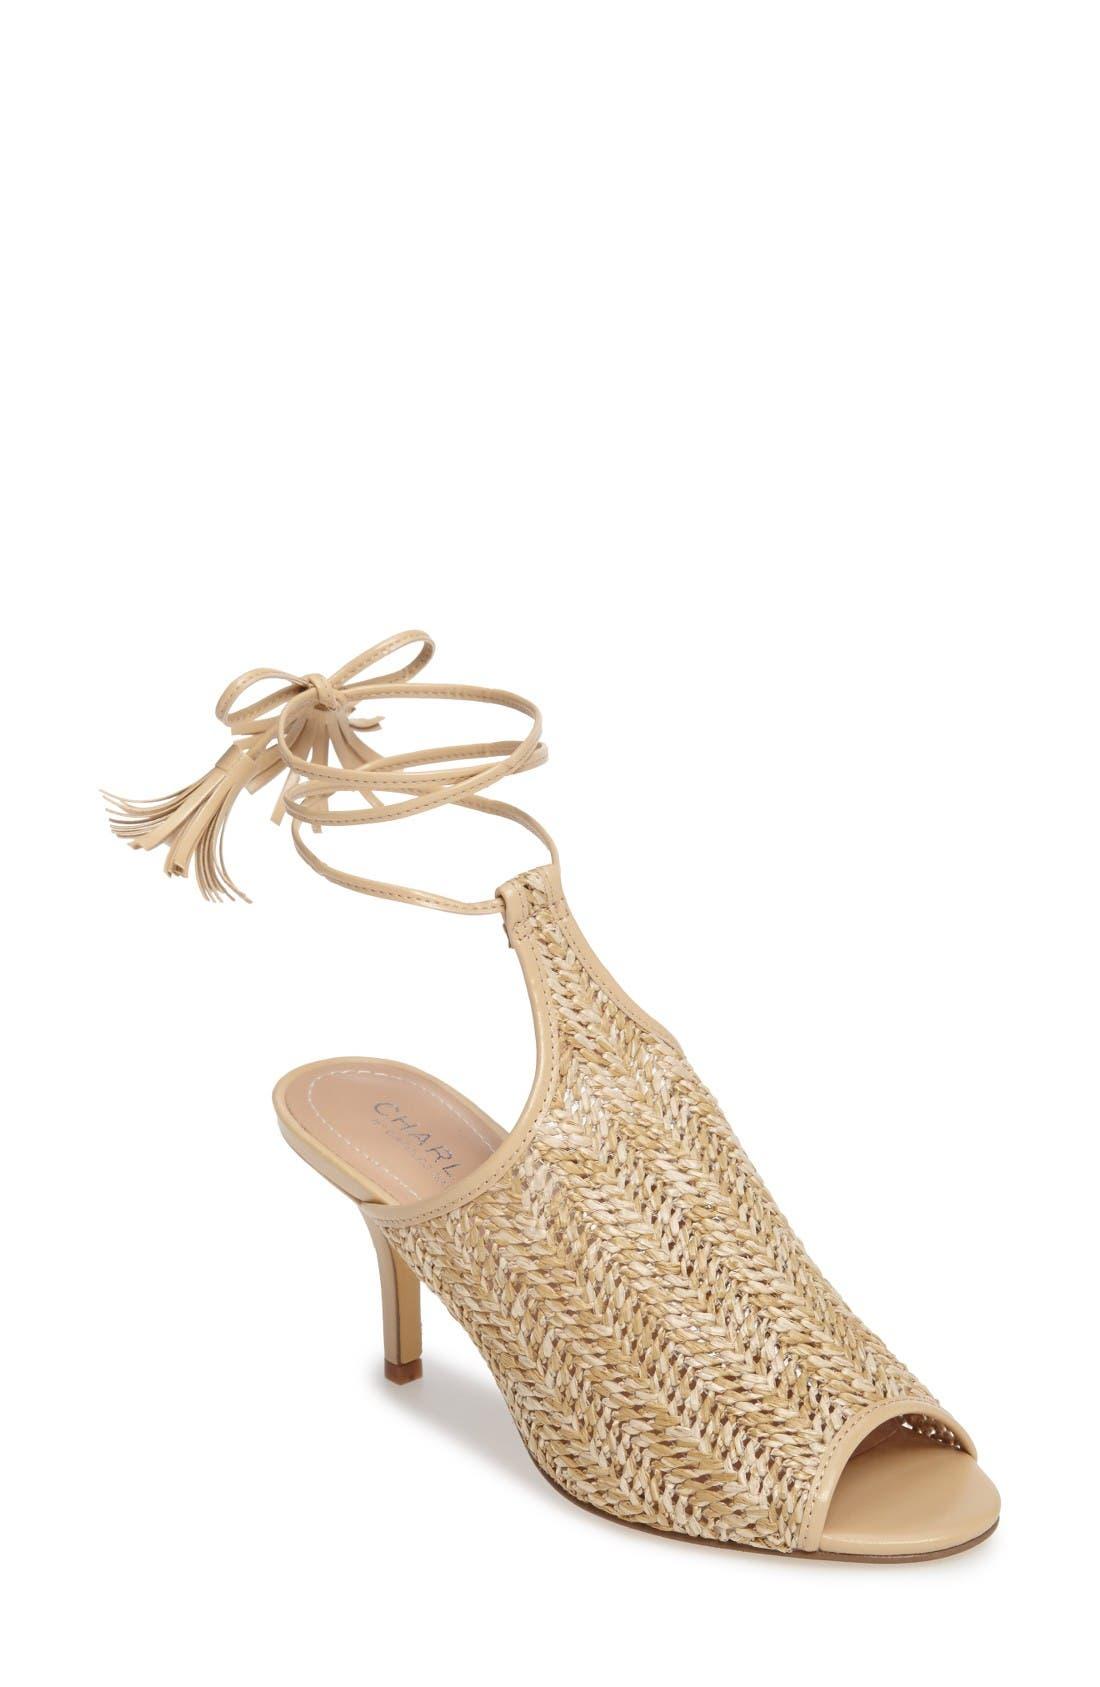 Main Image - Charles by Charles David Niko Ankle Tie Sandal (Women)